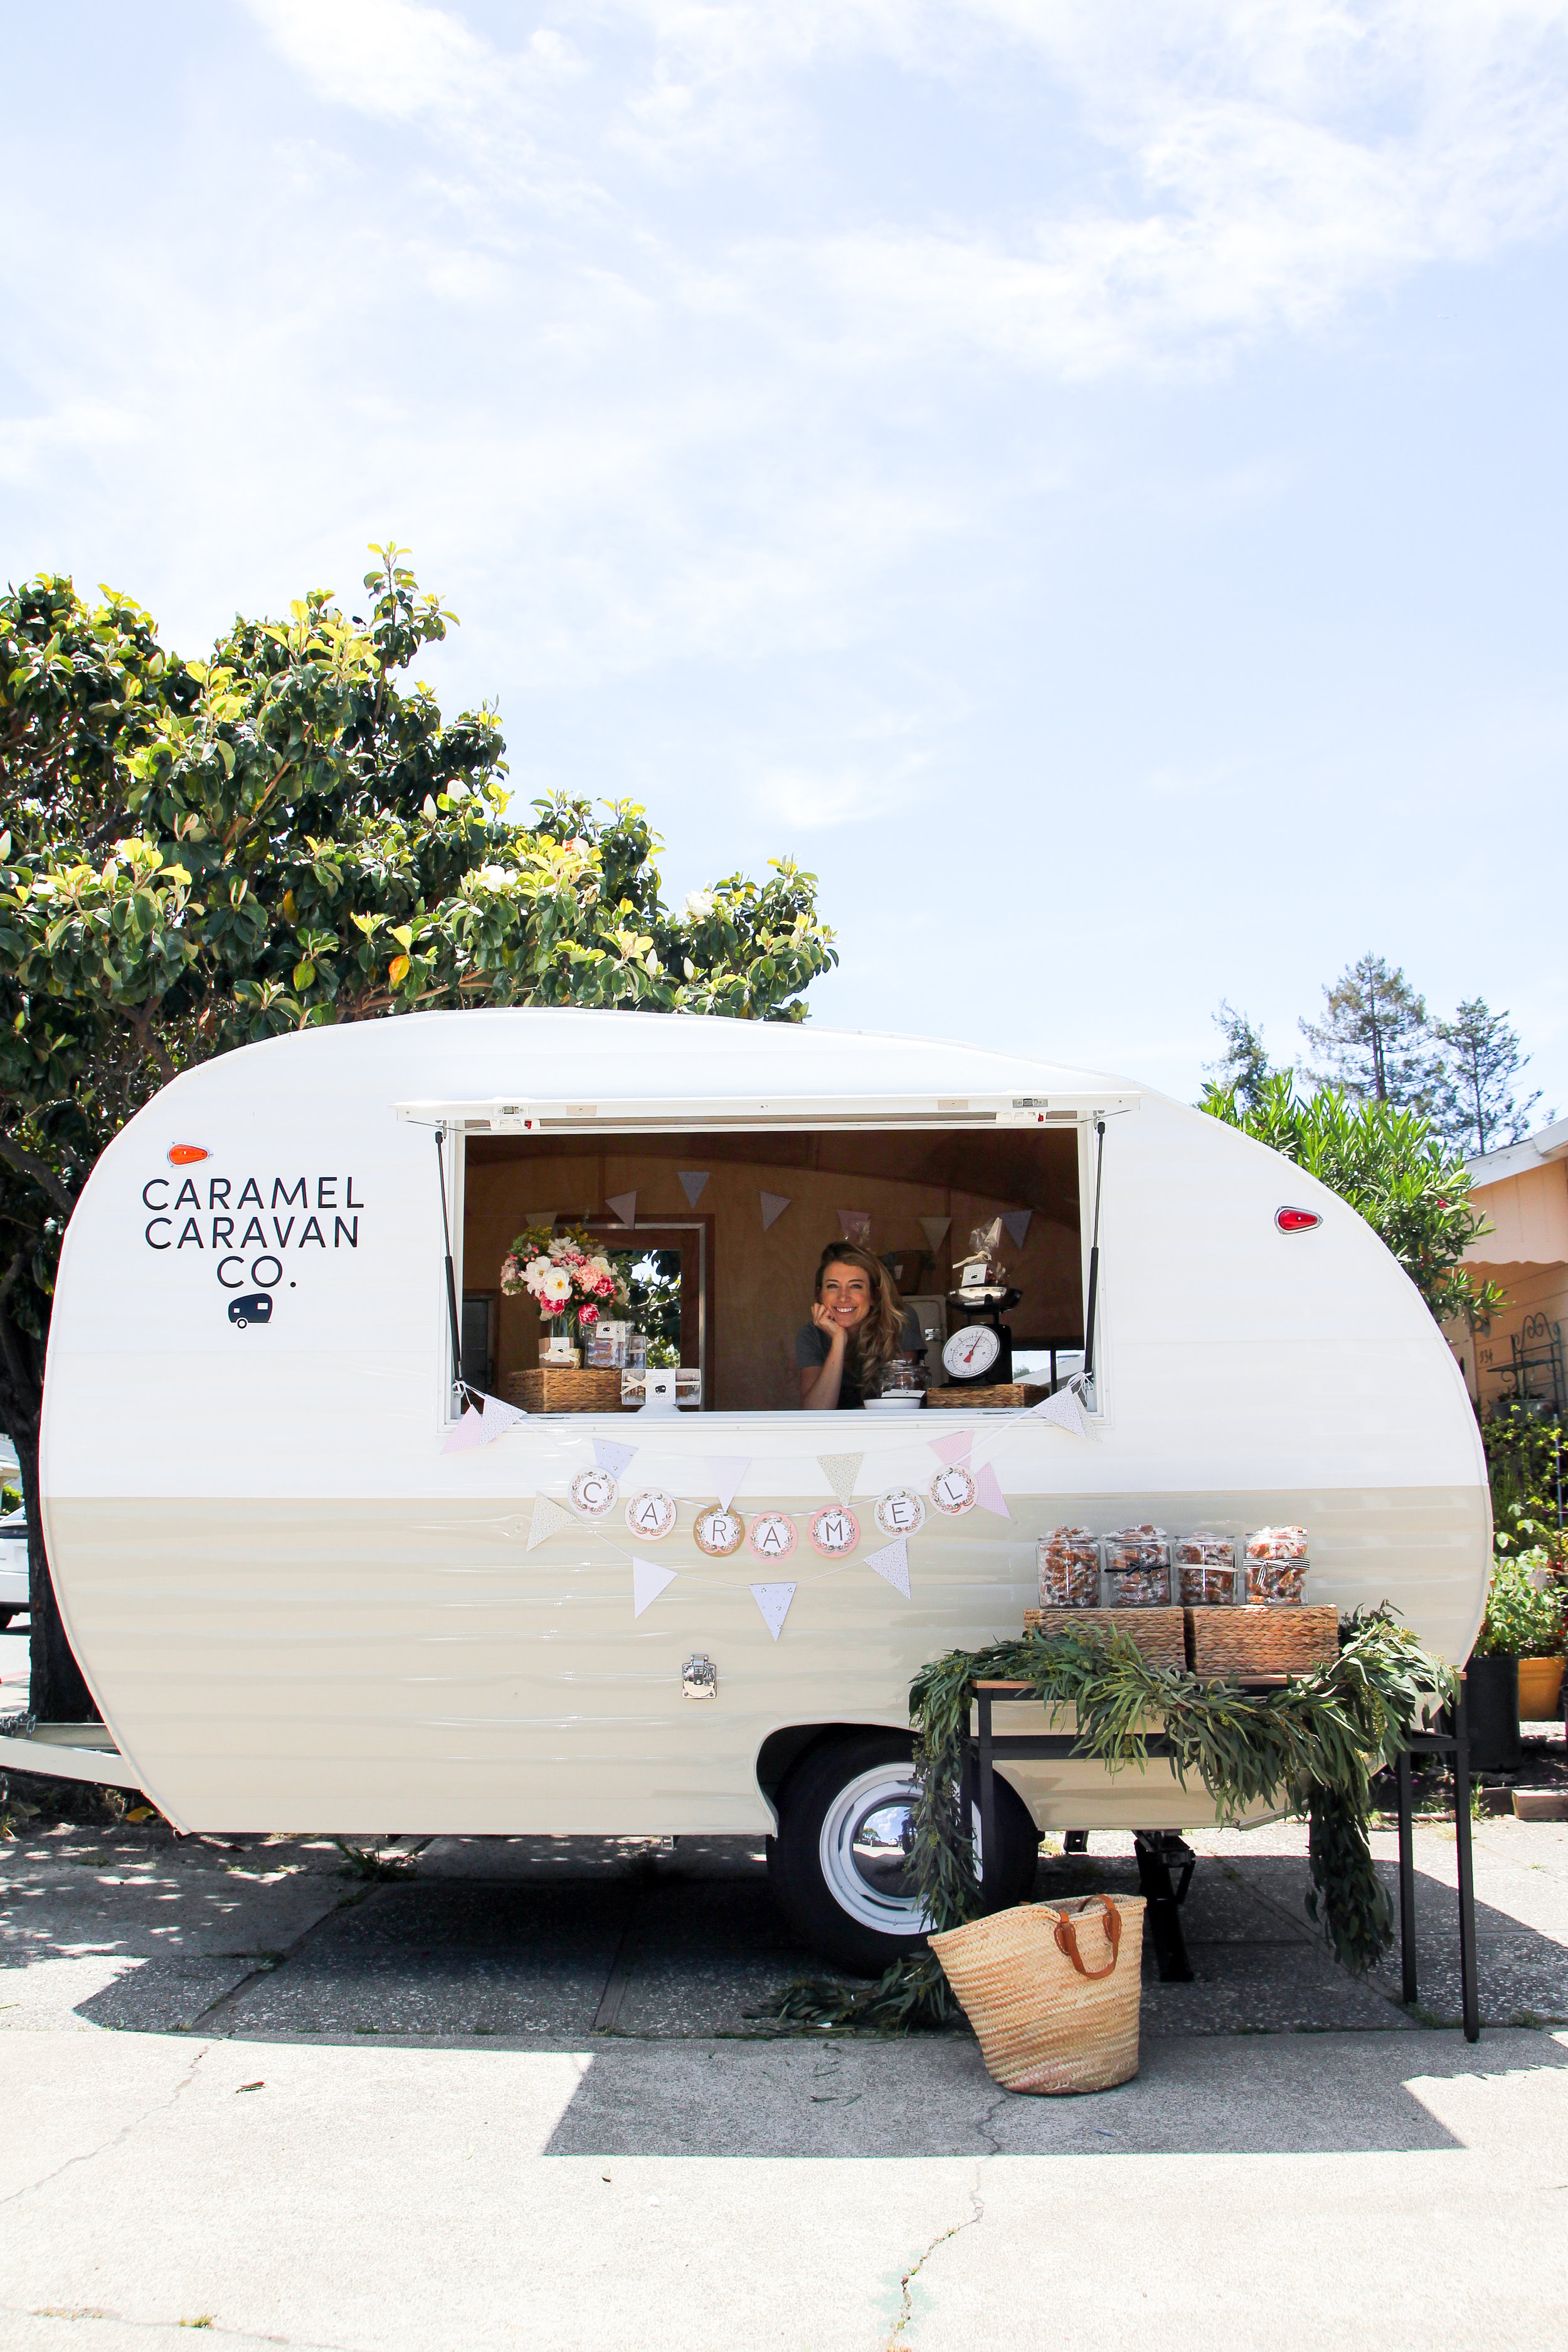 caramel caravan in san carlos